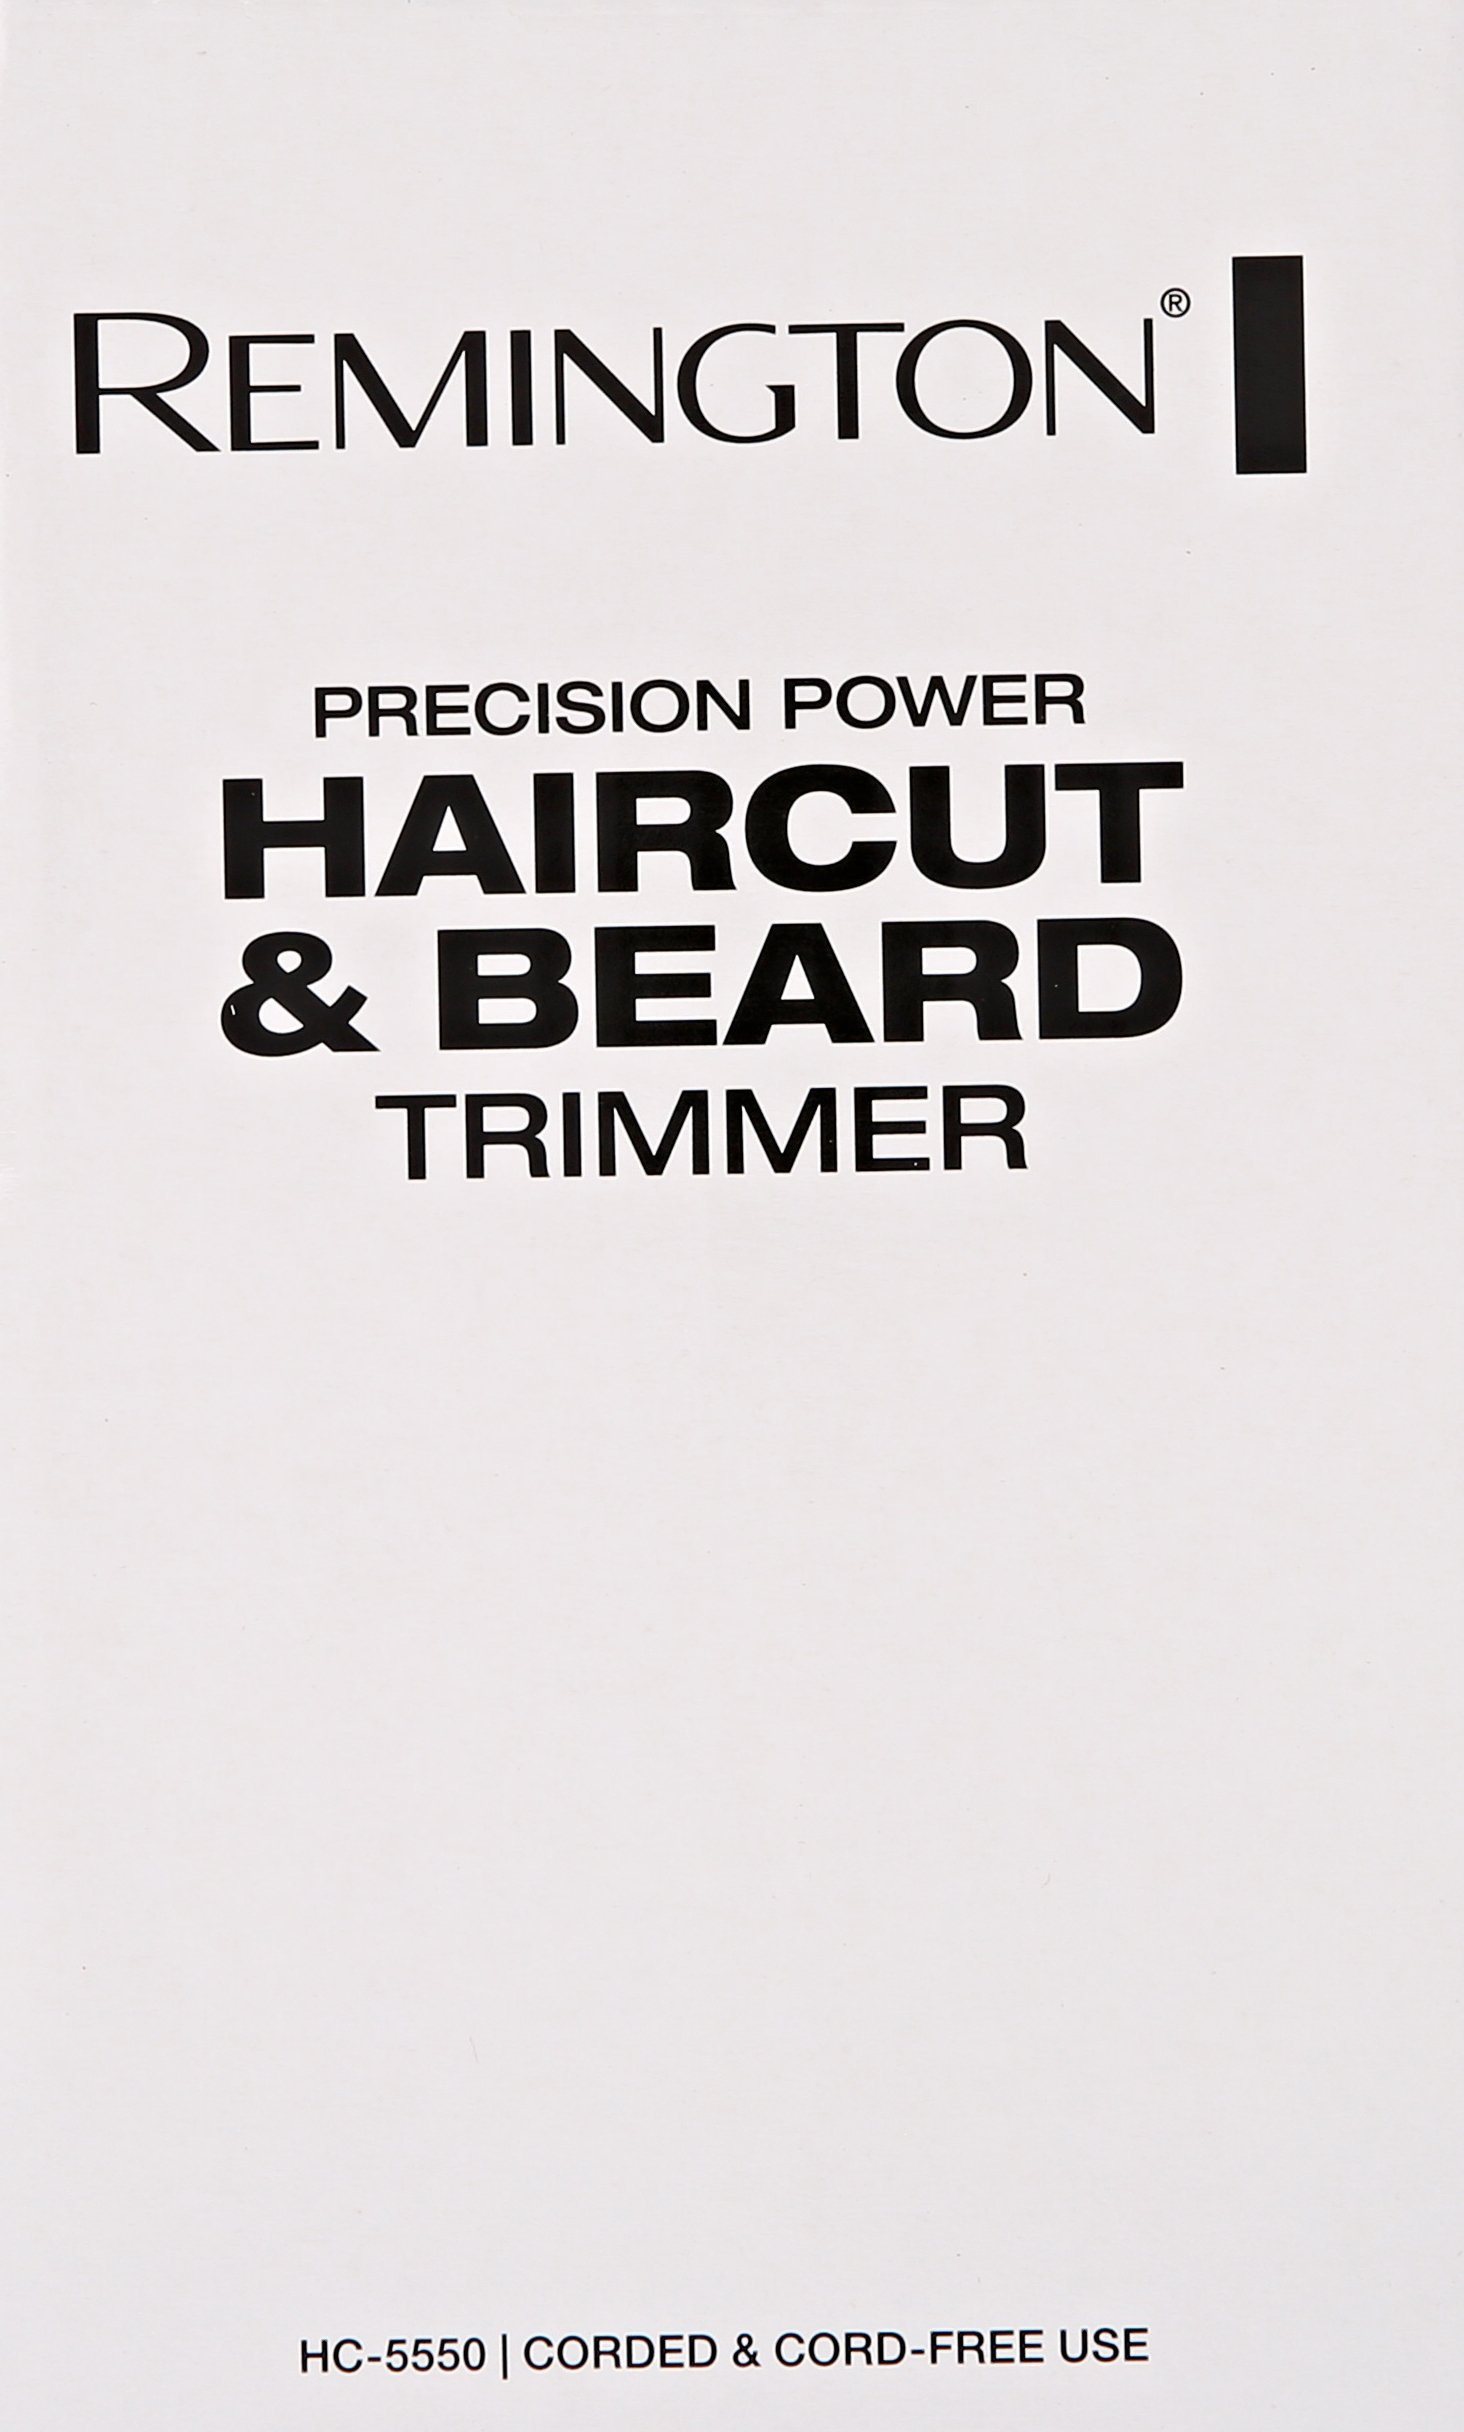 Remington HC5550AM Precision Power Haircut & Beard Trimmer, Hair Clippers, Beard Trimmer, Clippers by Remington (Image #5)